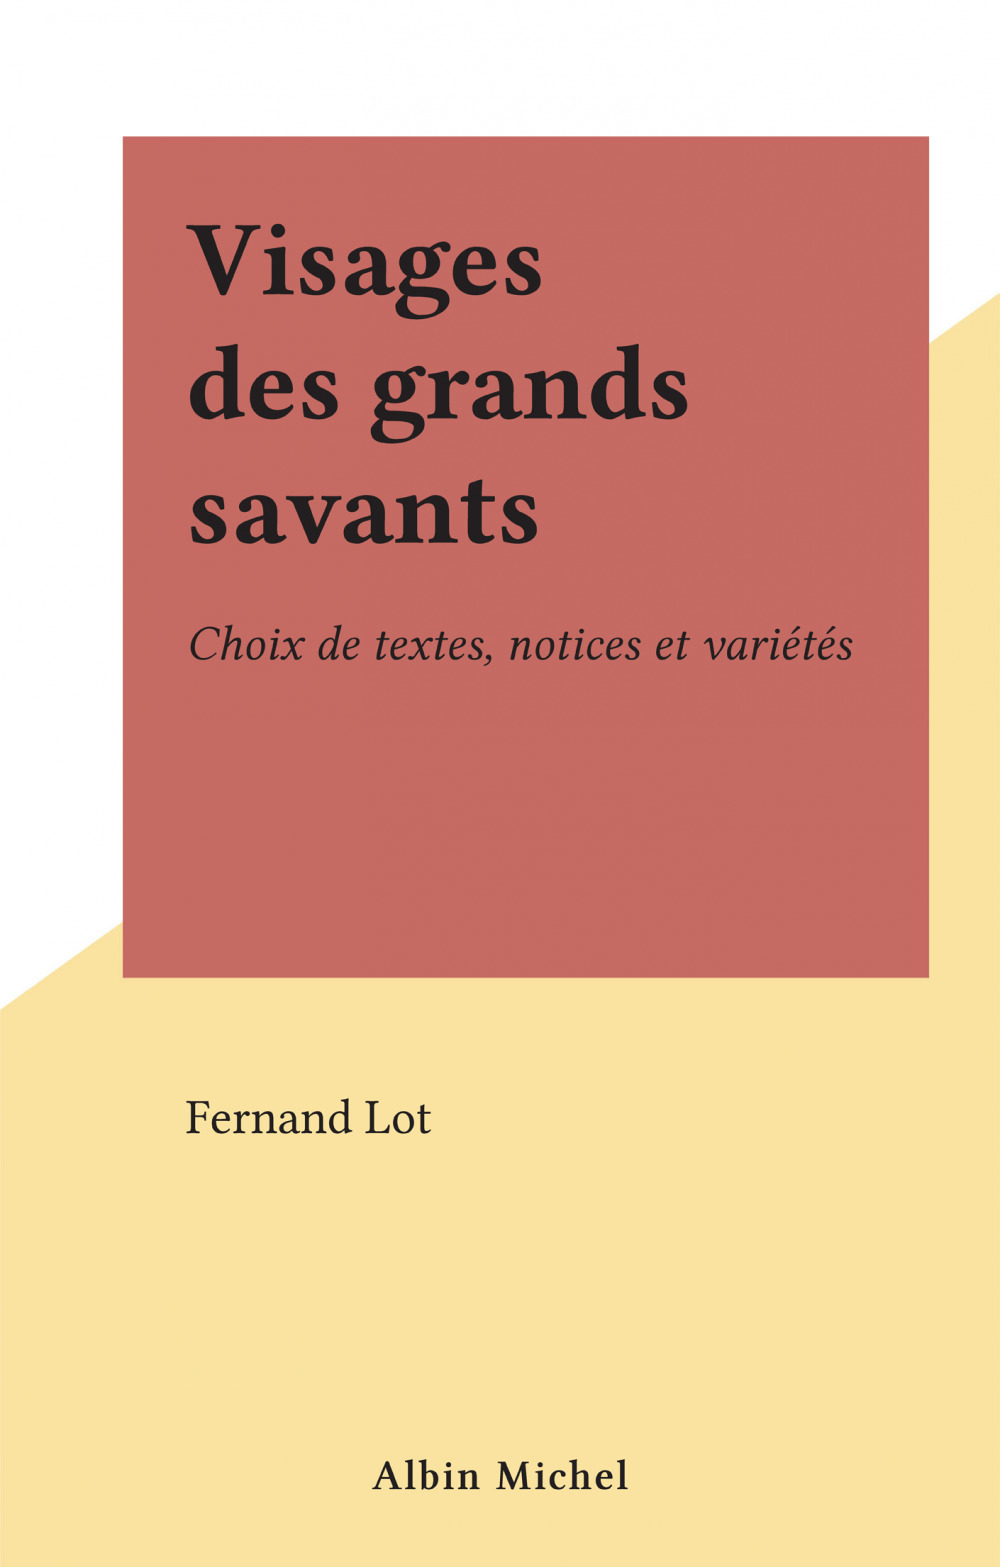 Visages des grands savants  - Fernand Lot